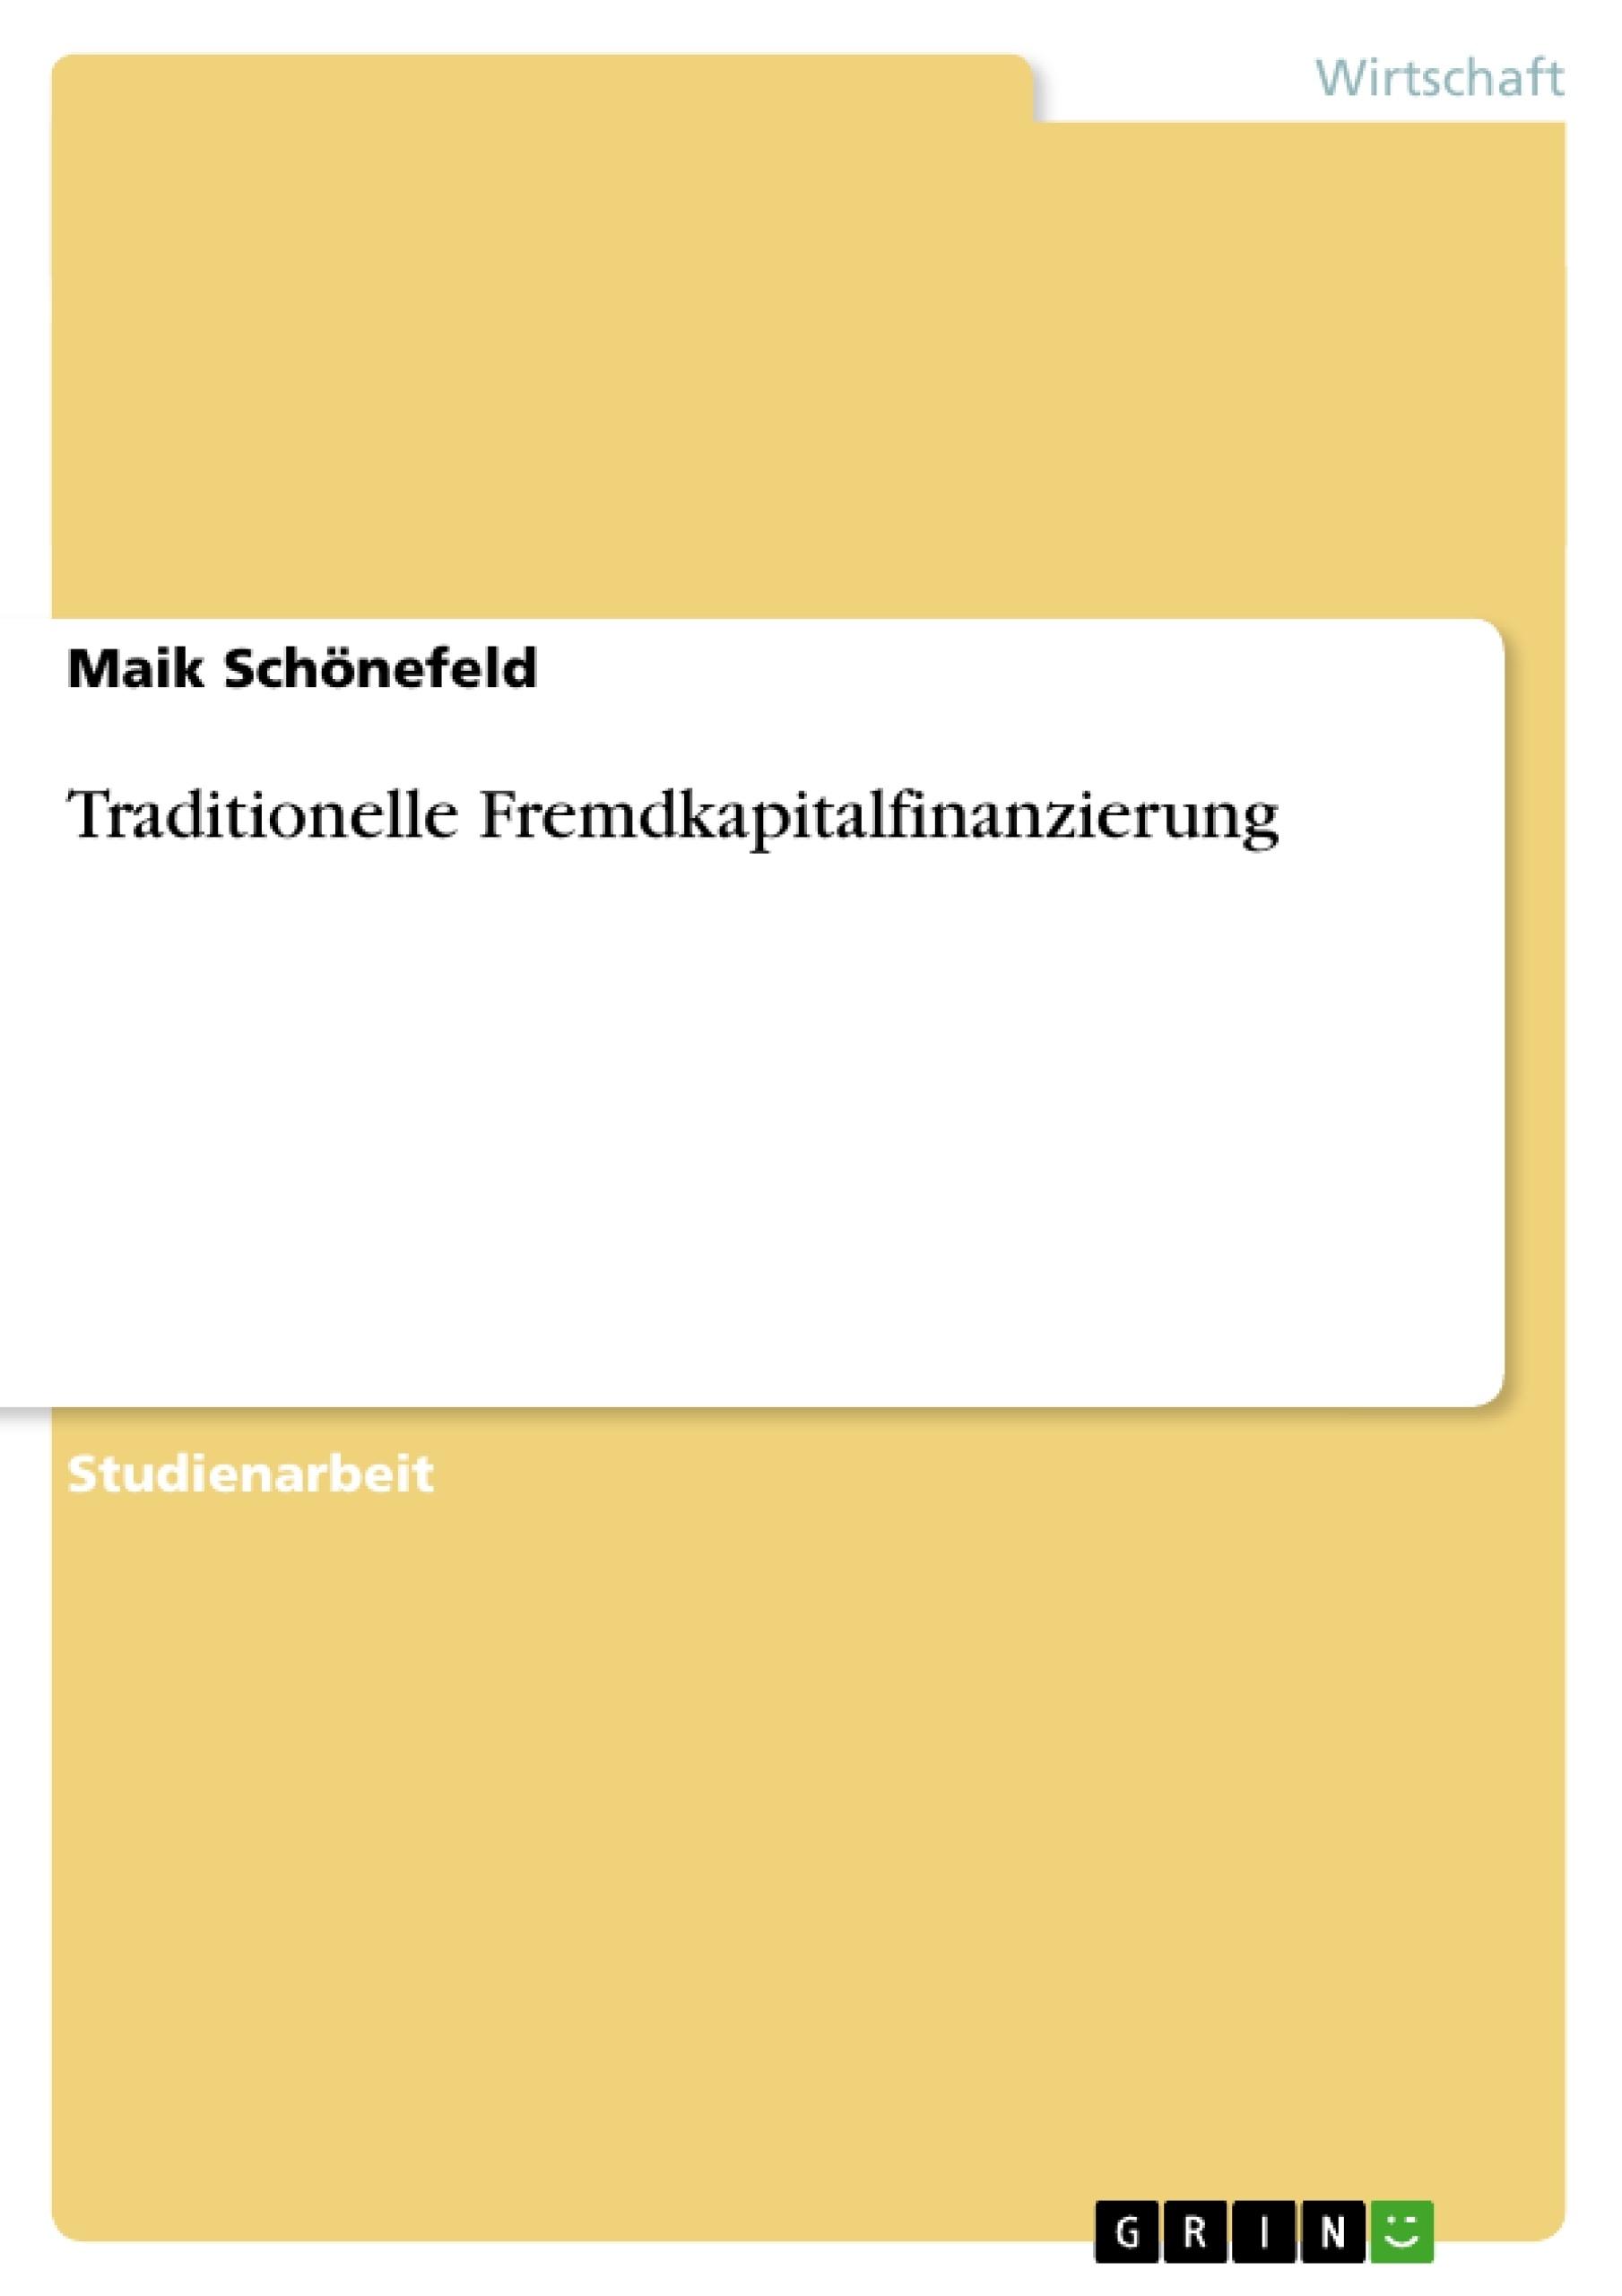 Titel: Traditionelle Fremdkapitalfinanzierung